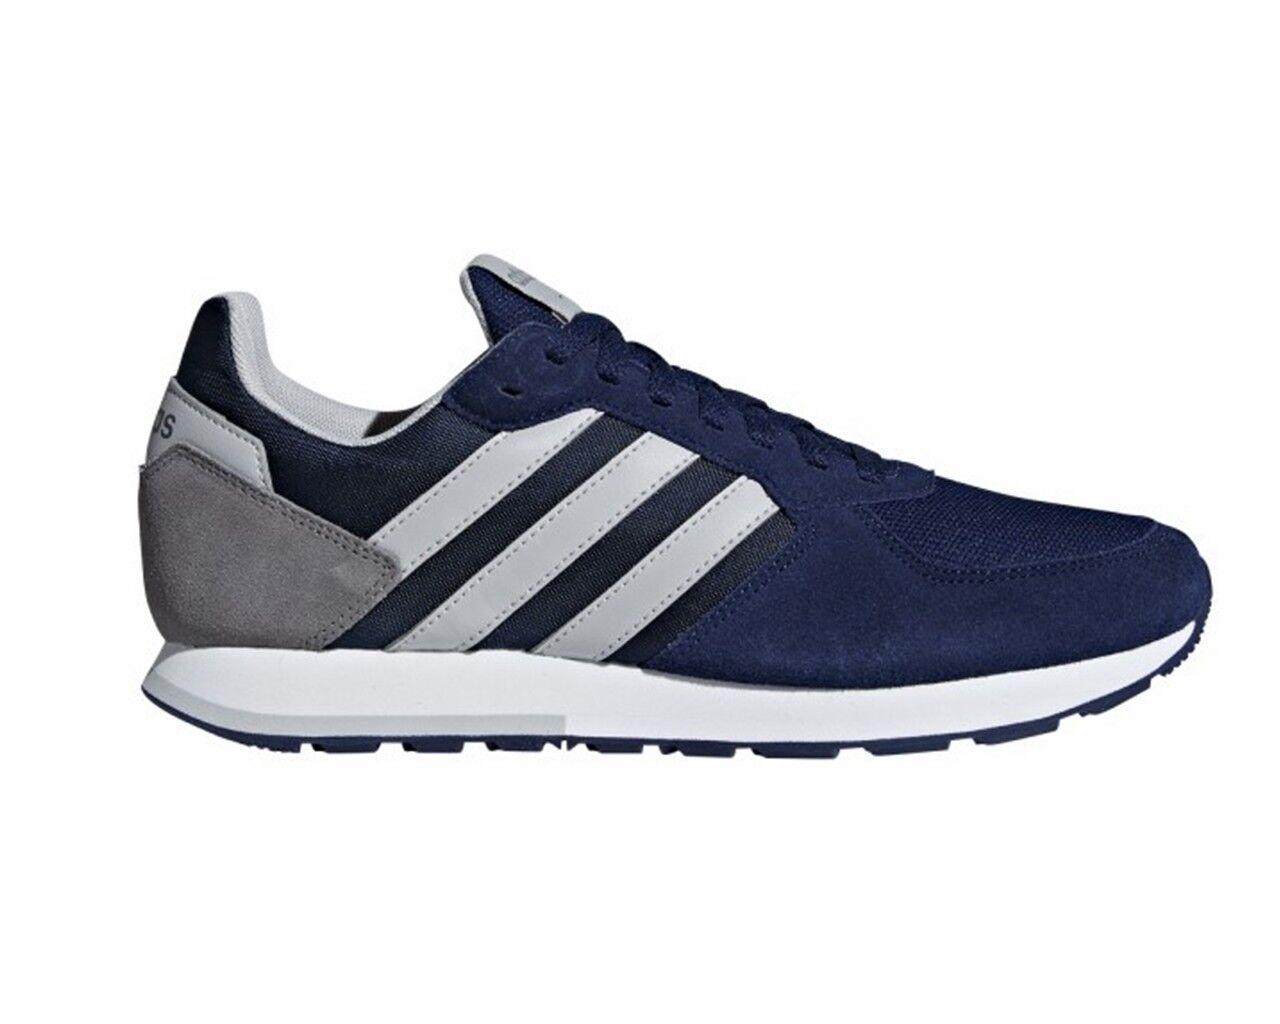 Adidas 8K Dark B44669 Hombre Trainers Dark 8K Azul Gym Zapatos fa40ab